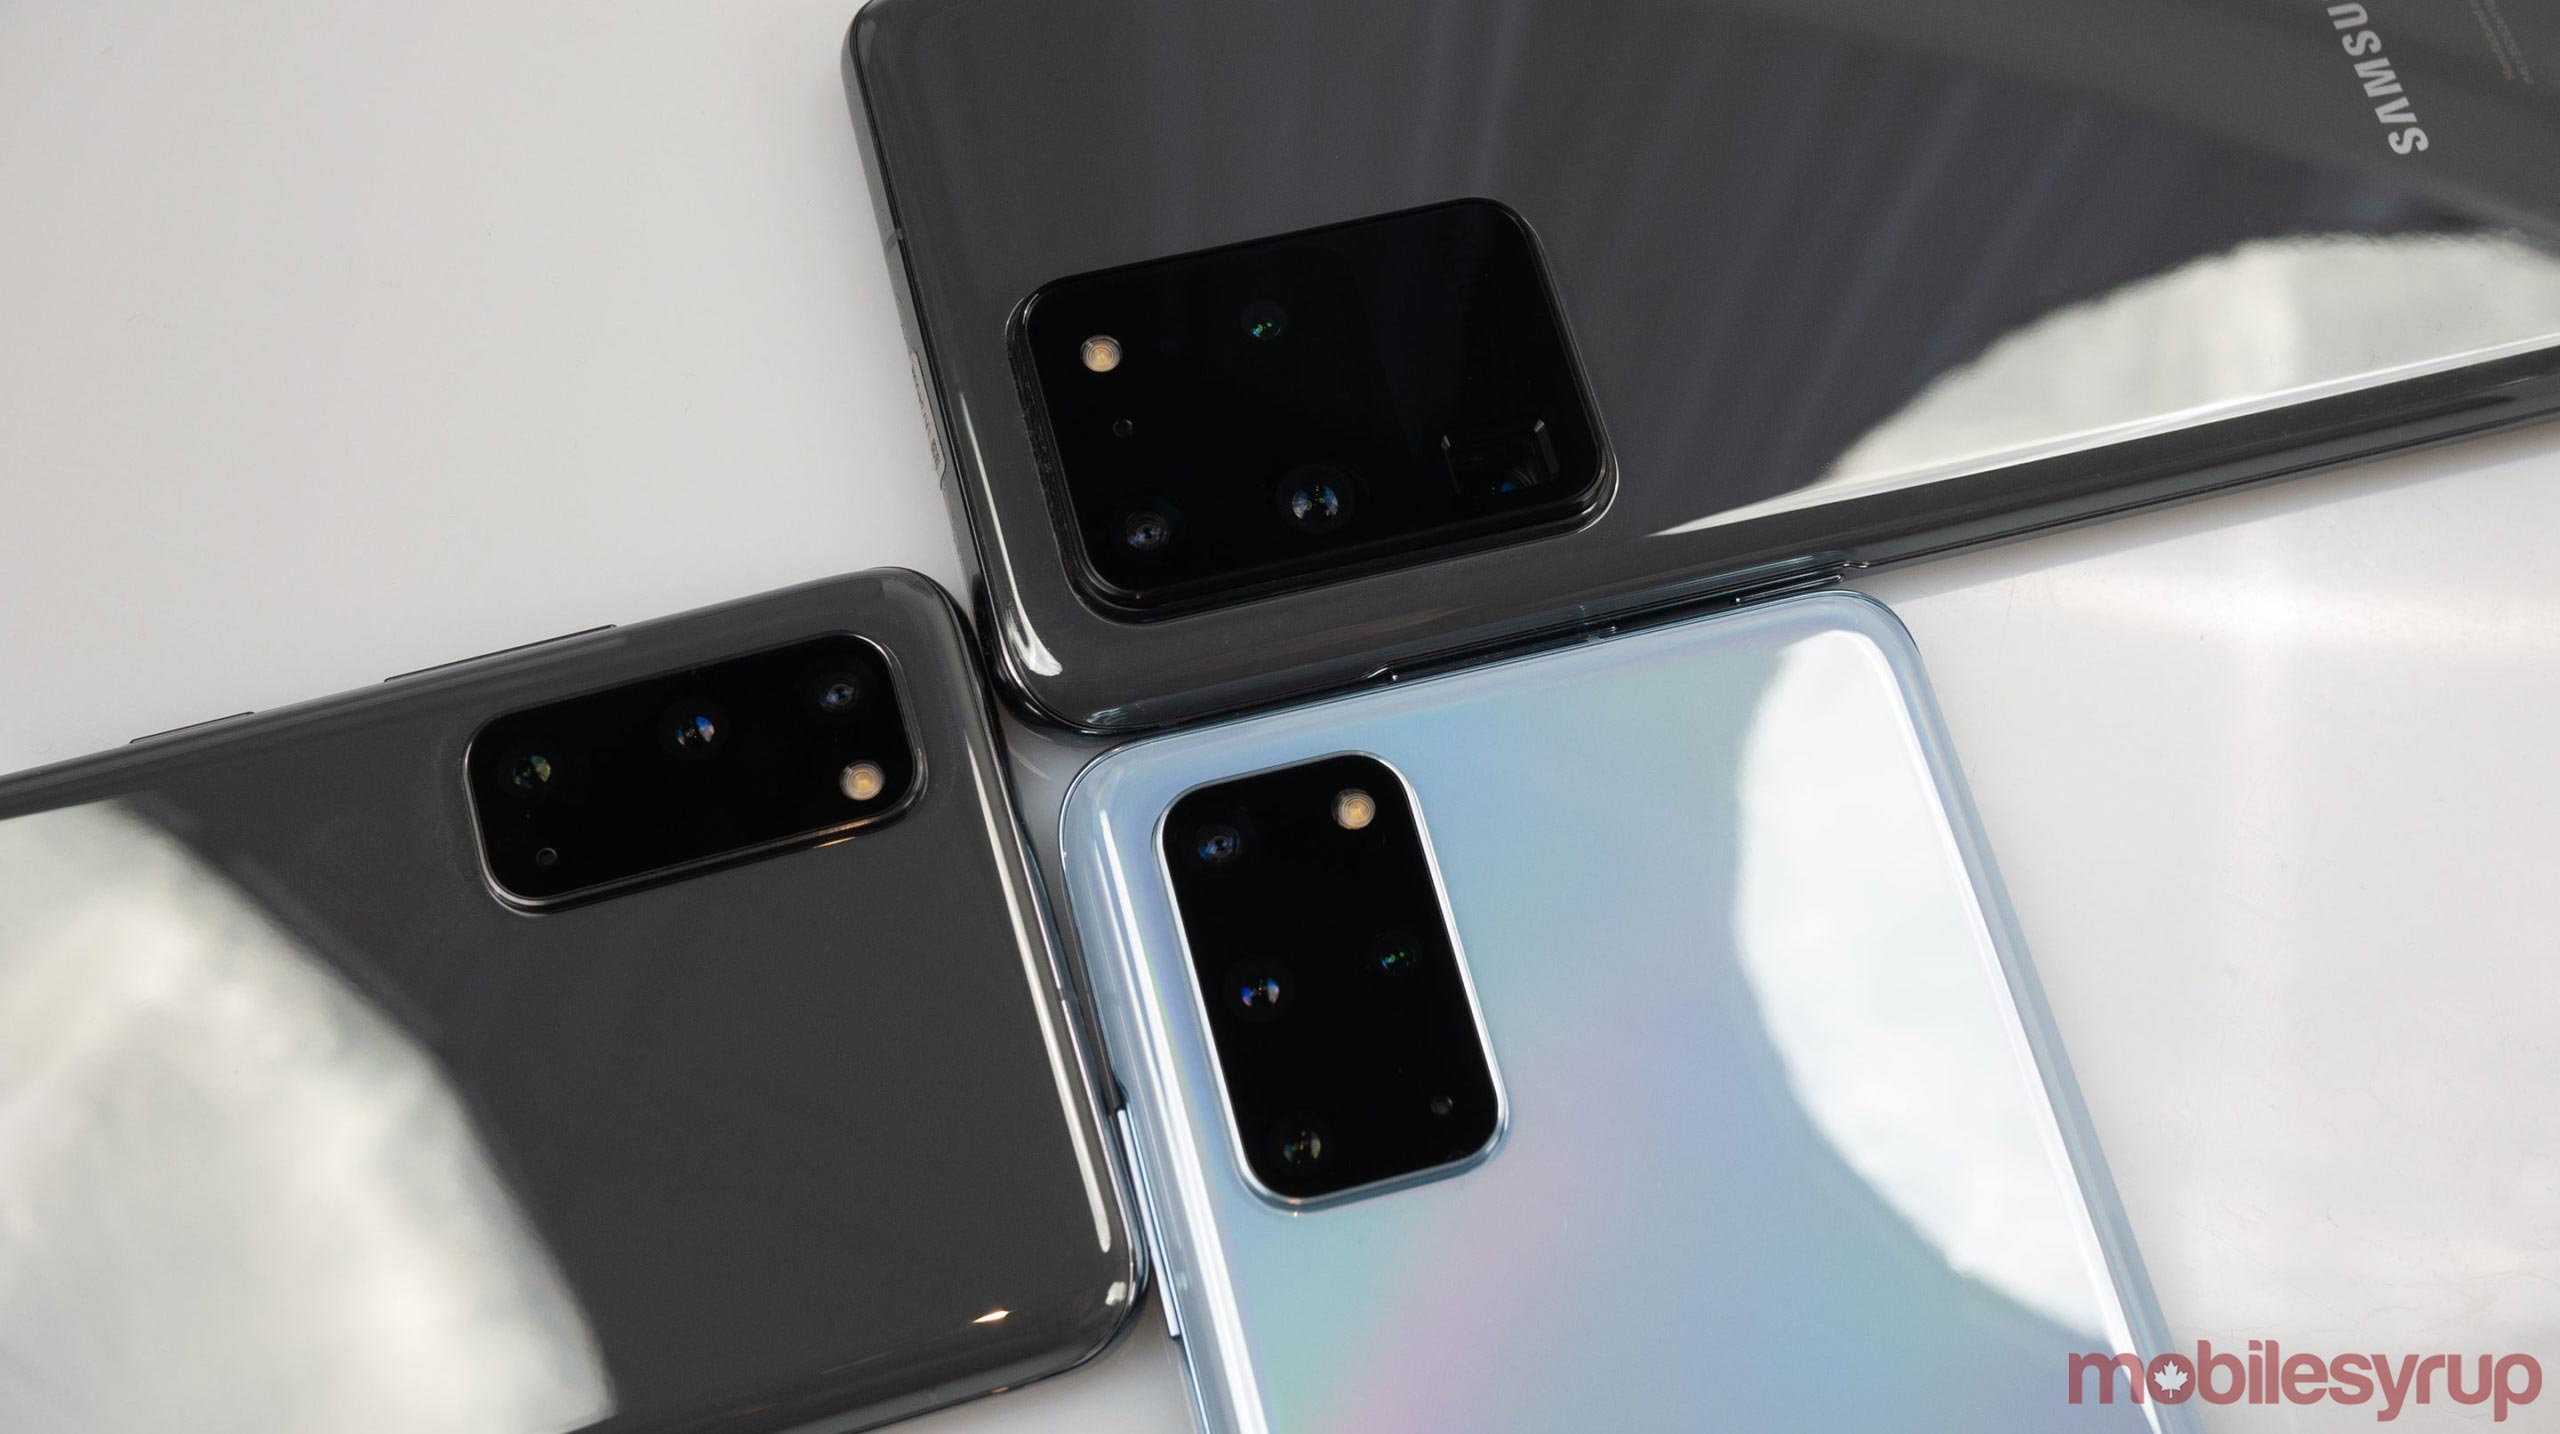 The Cosmic Daydream Samsung S10 Case